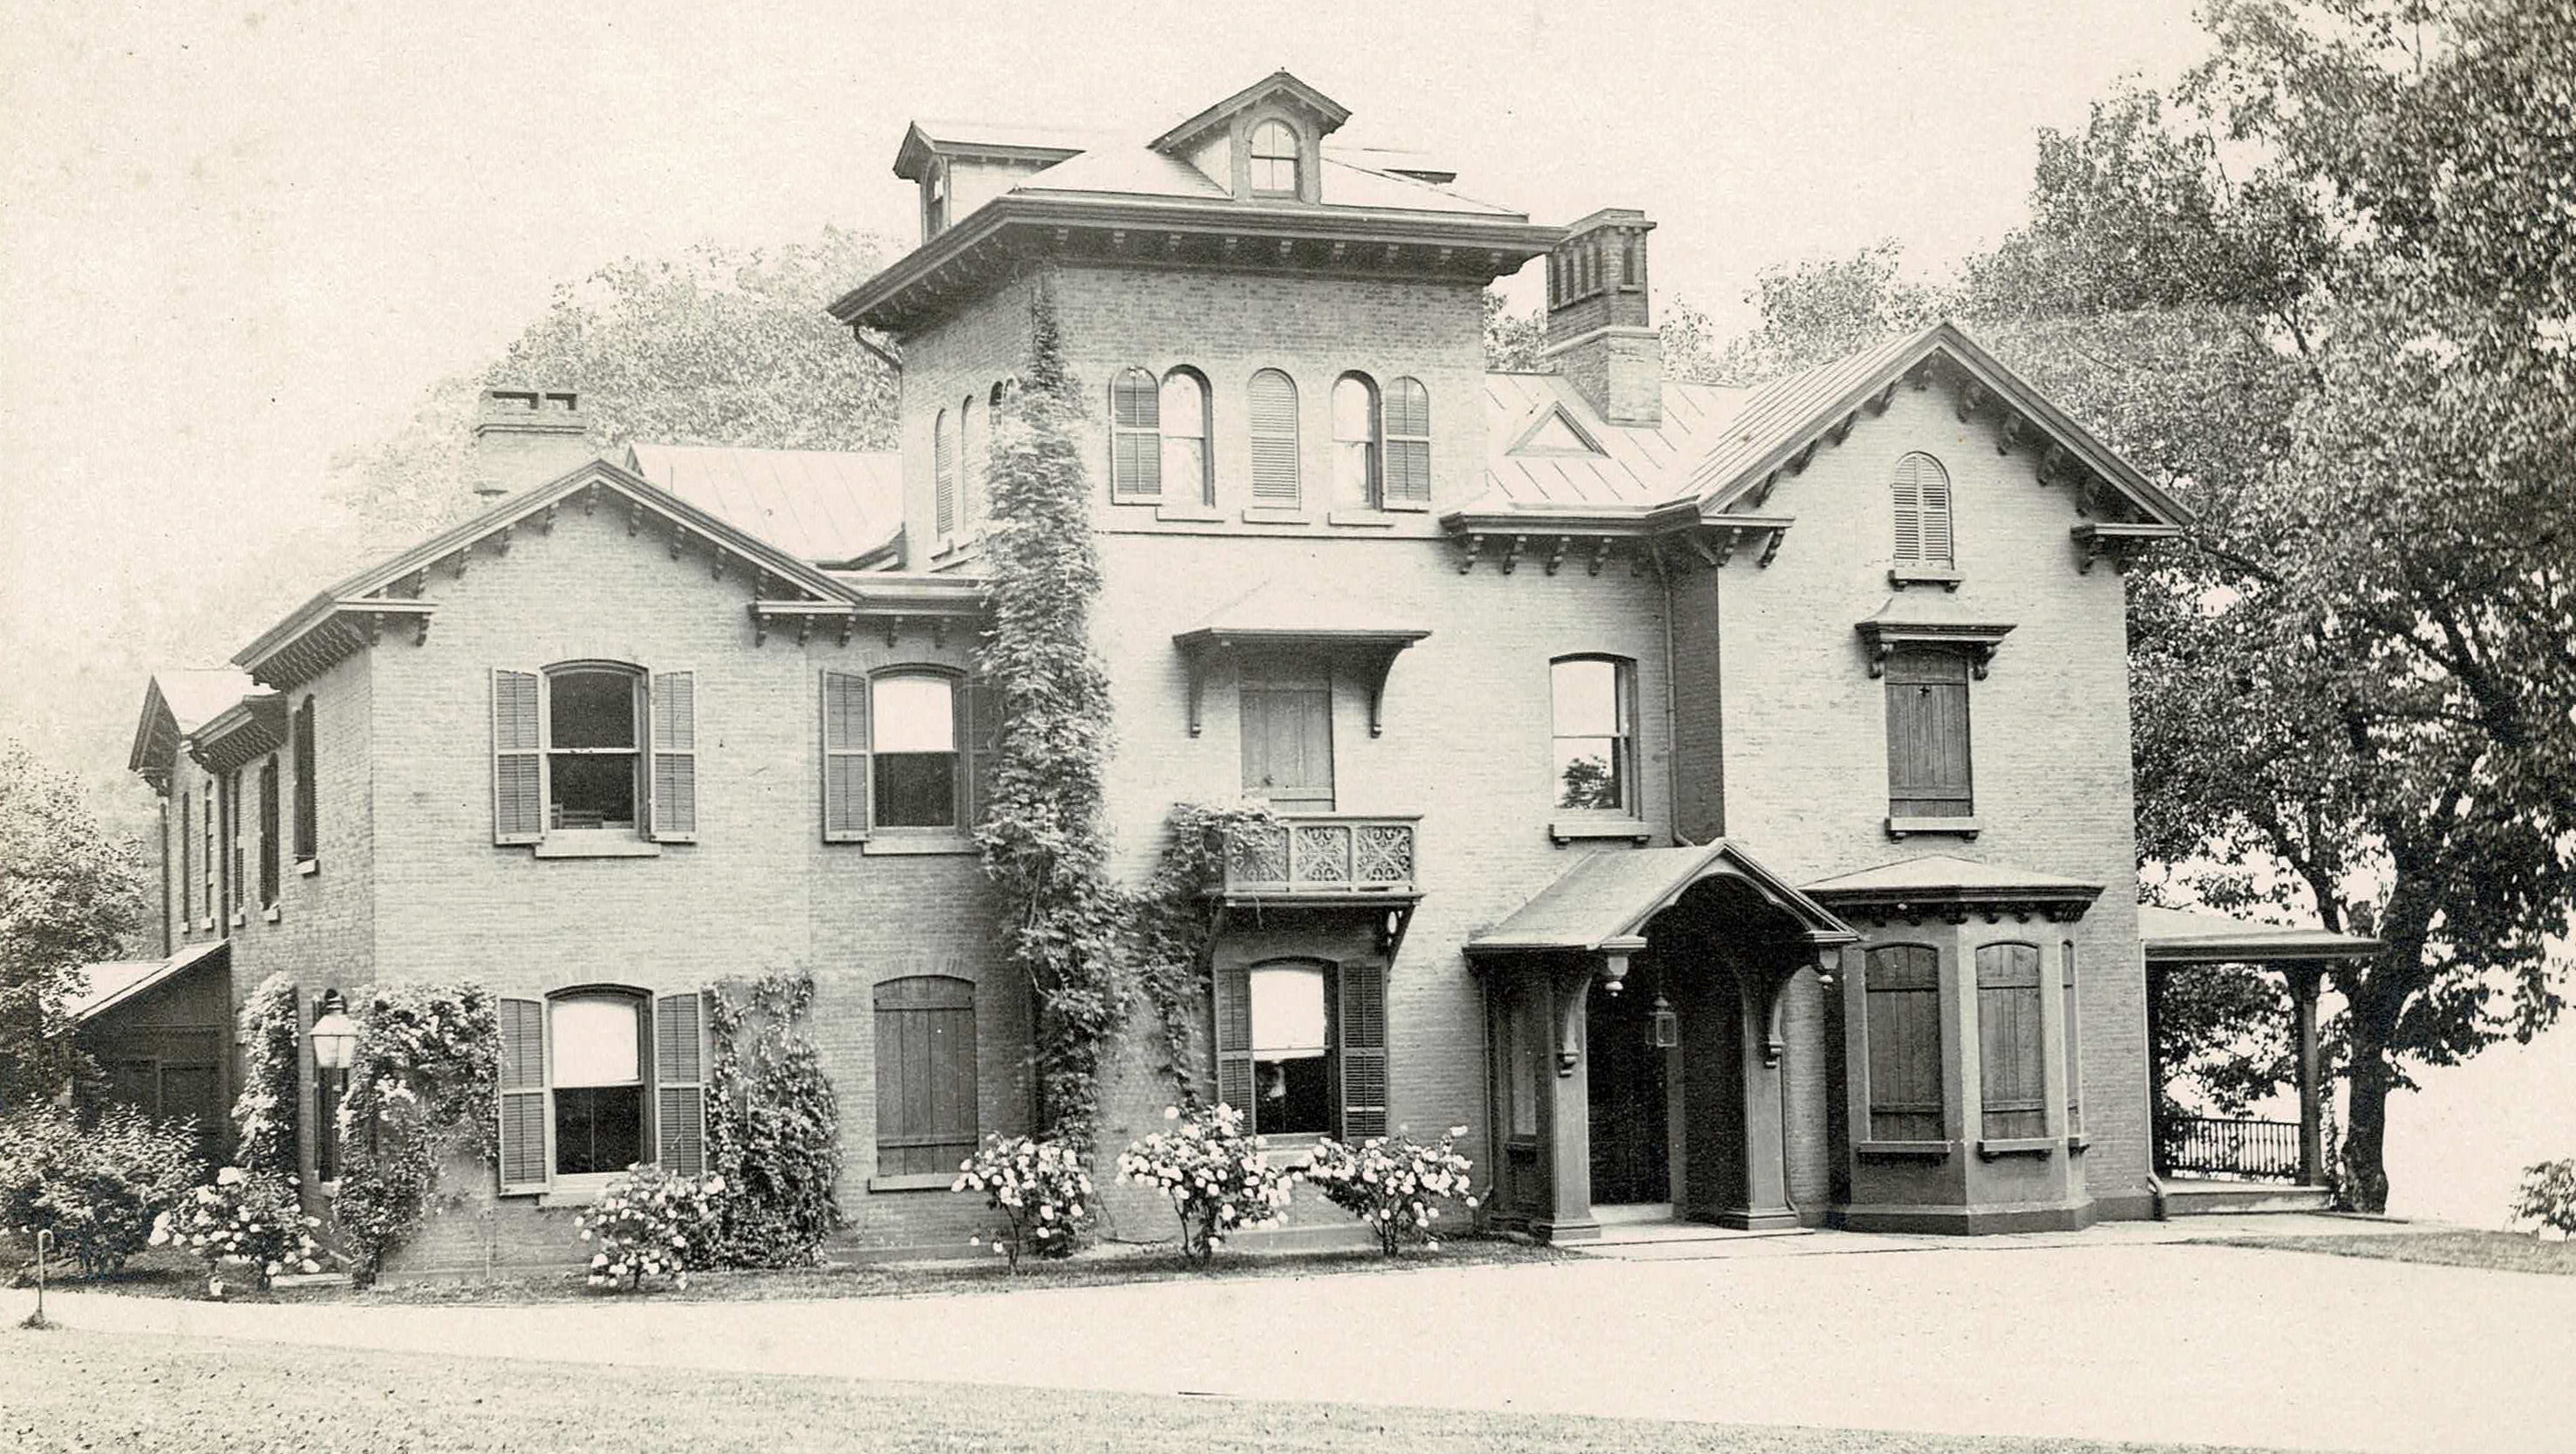 The Hudson House